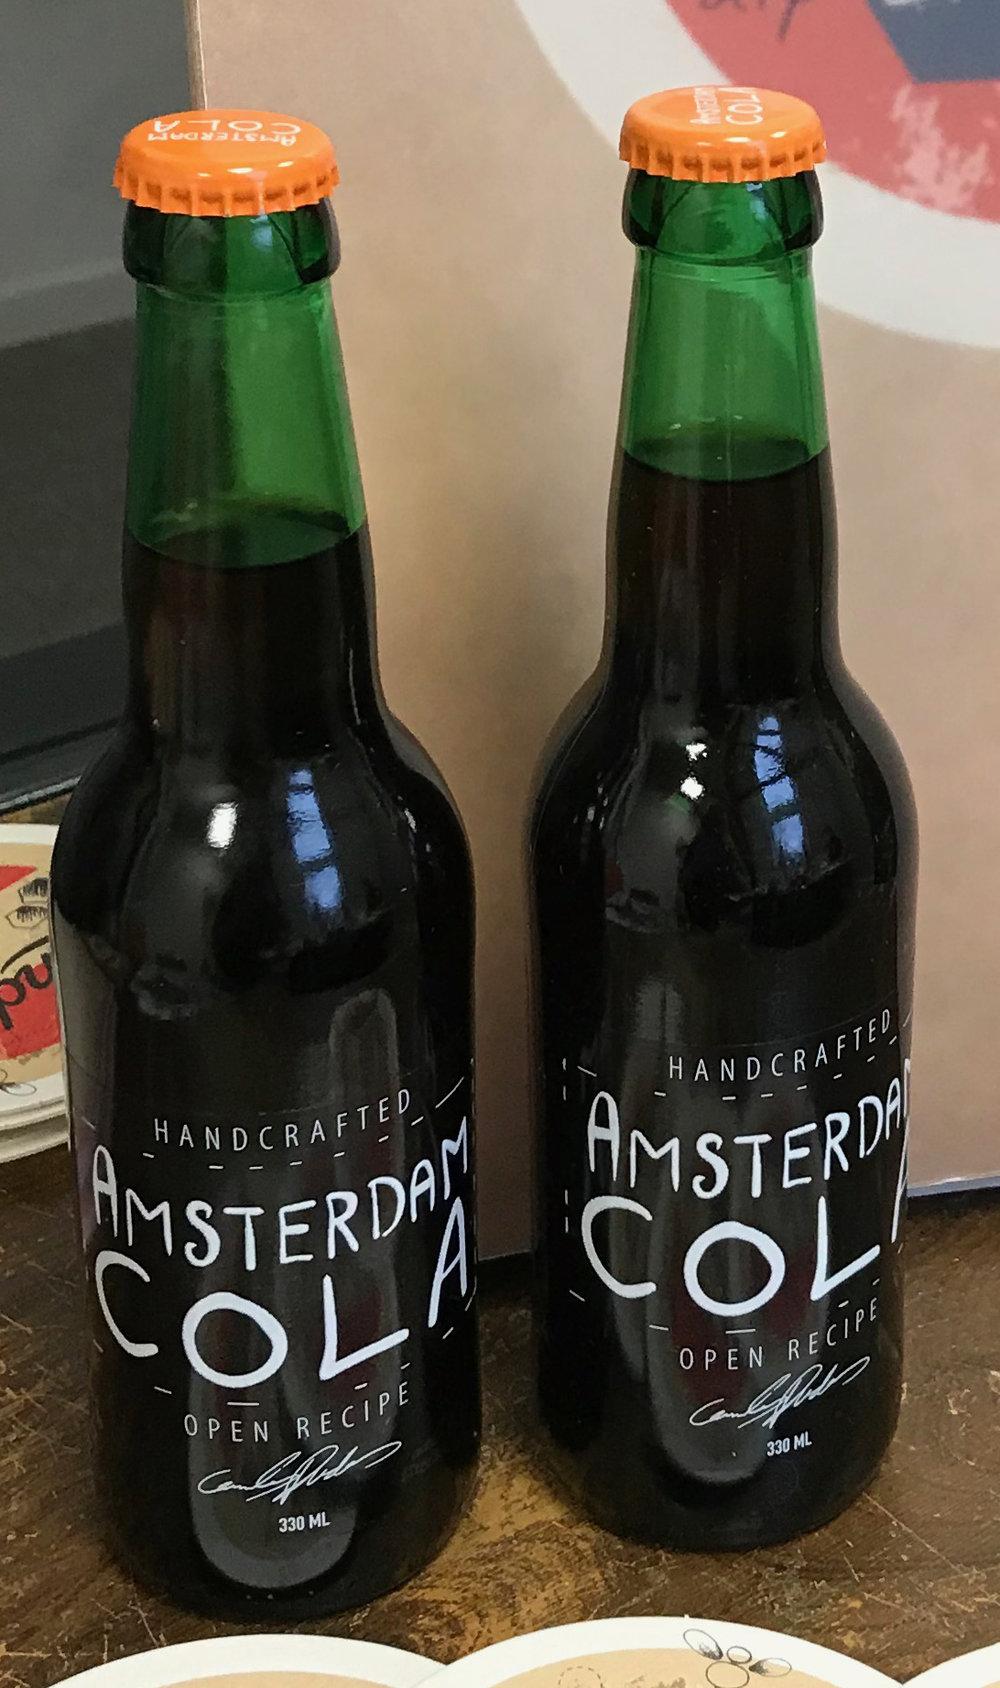 ZandBij_Waterconcept_AmsterdamCola_fles.jpg